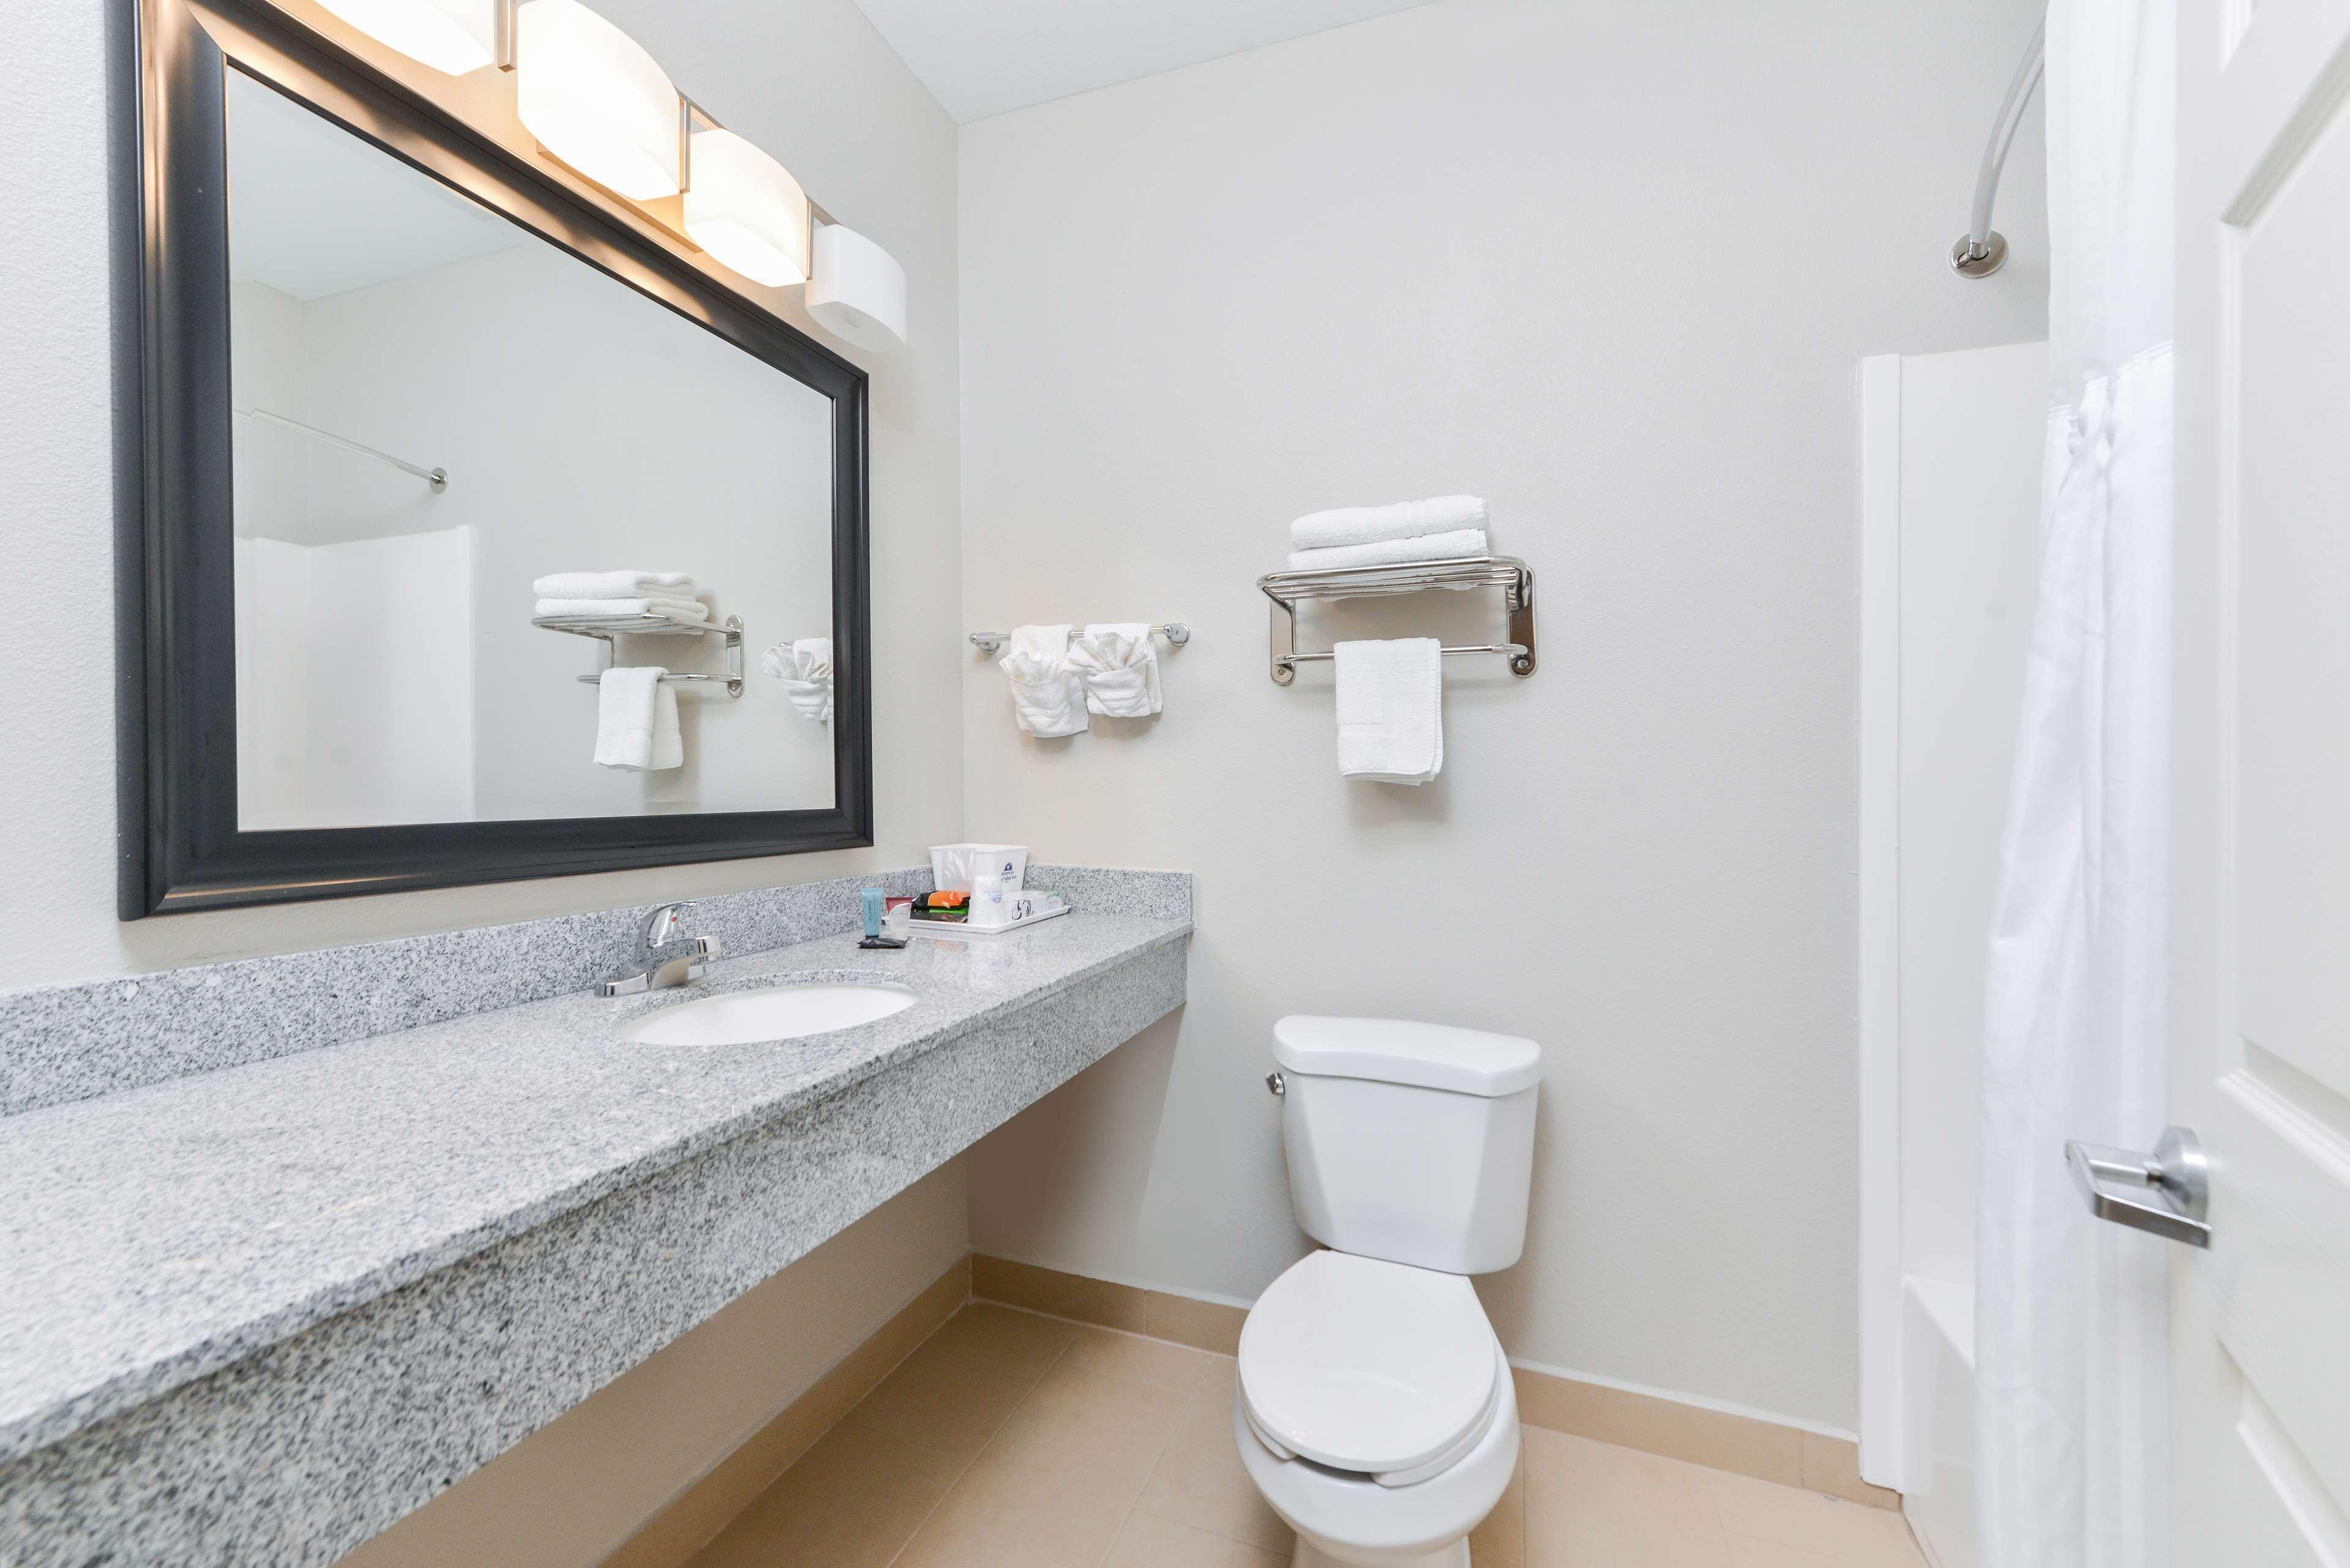 Americas Best Value Inn - Baton Rouge / College Drive image 14